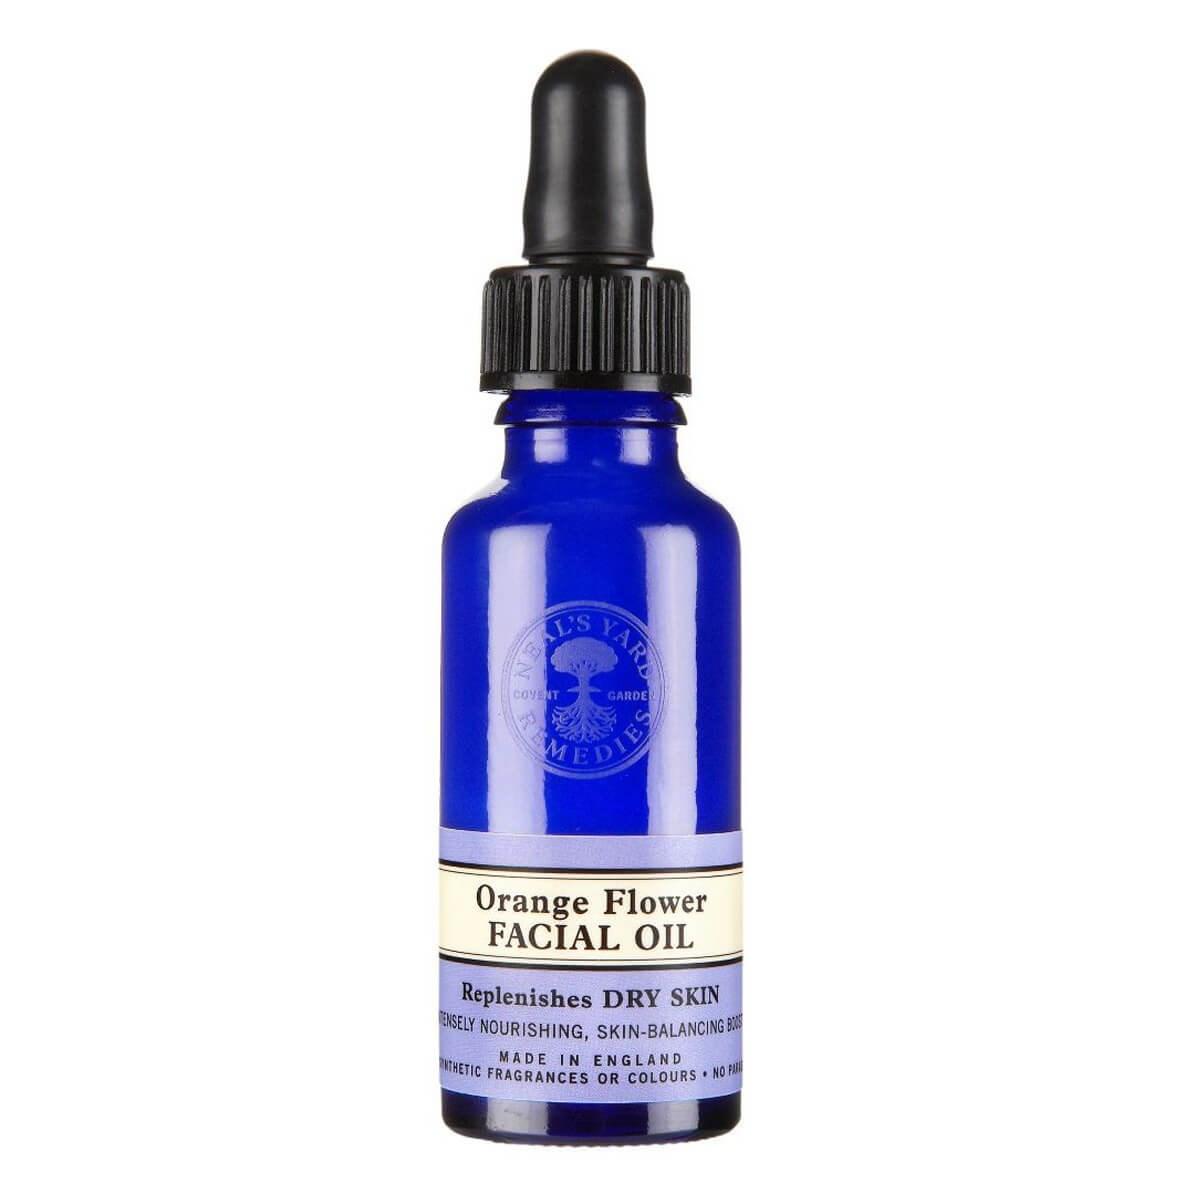 Neal's Yard Remedies Orange Flower Facial Oil